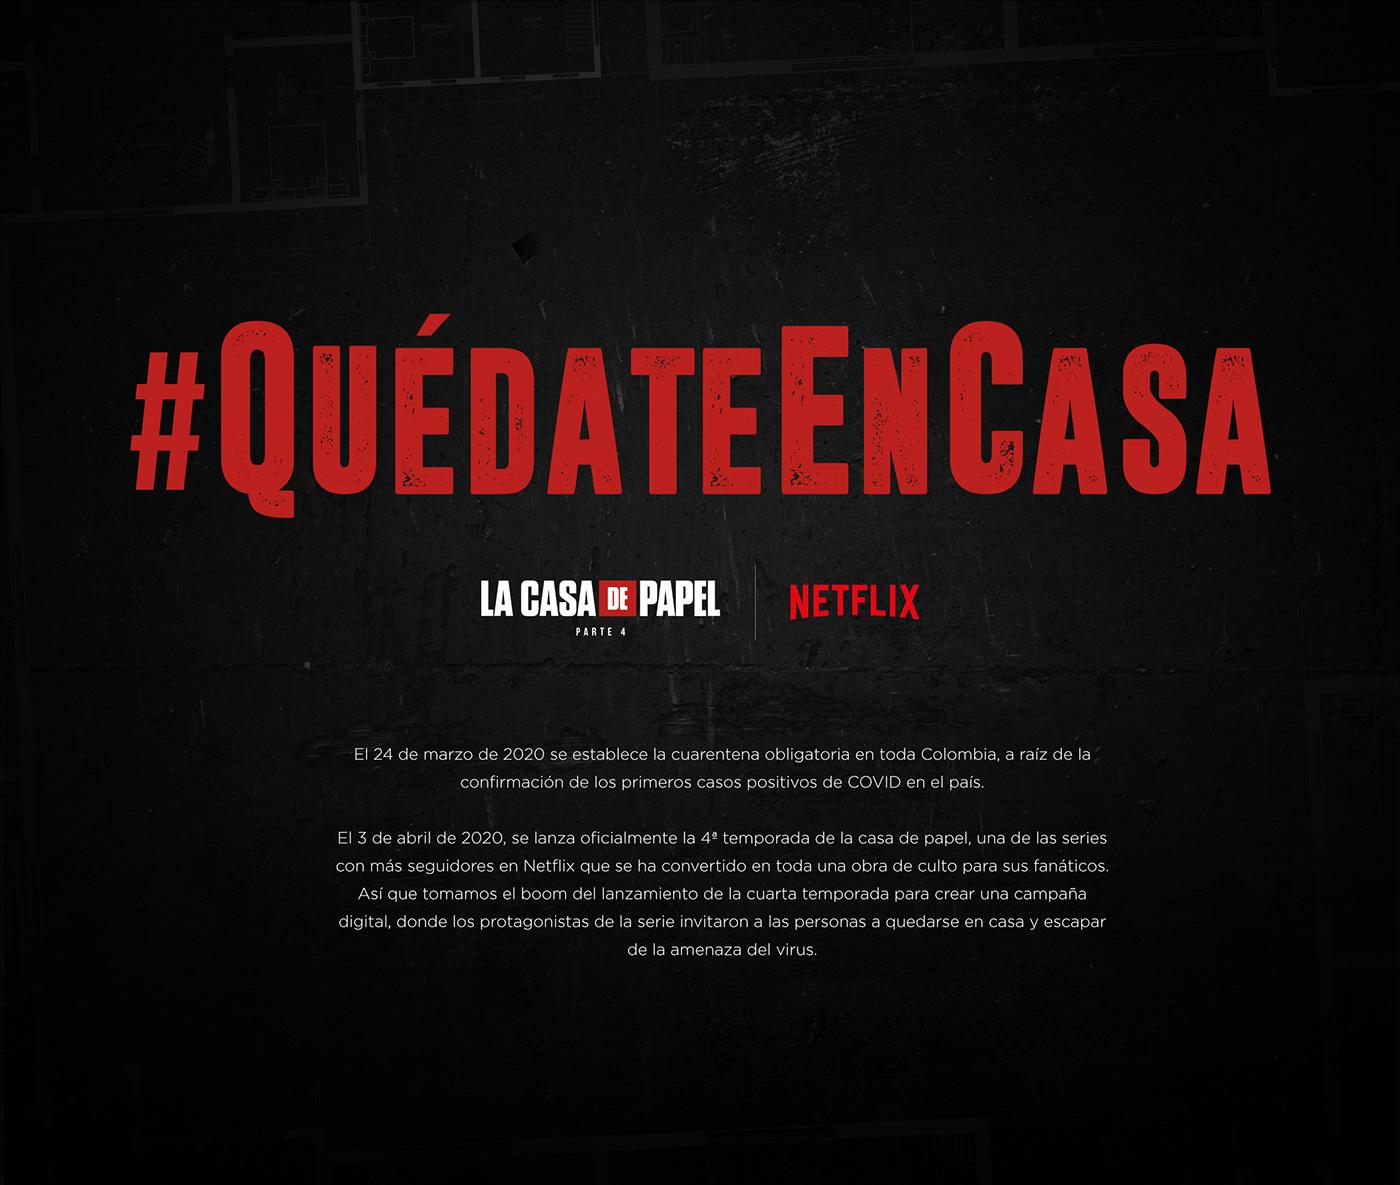 casadepapel digital elprofesor Netflix proteccion wundermanthompson